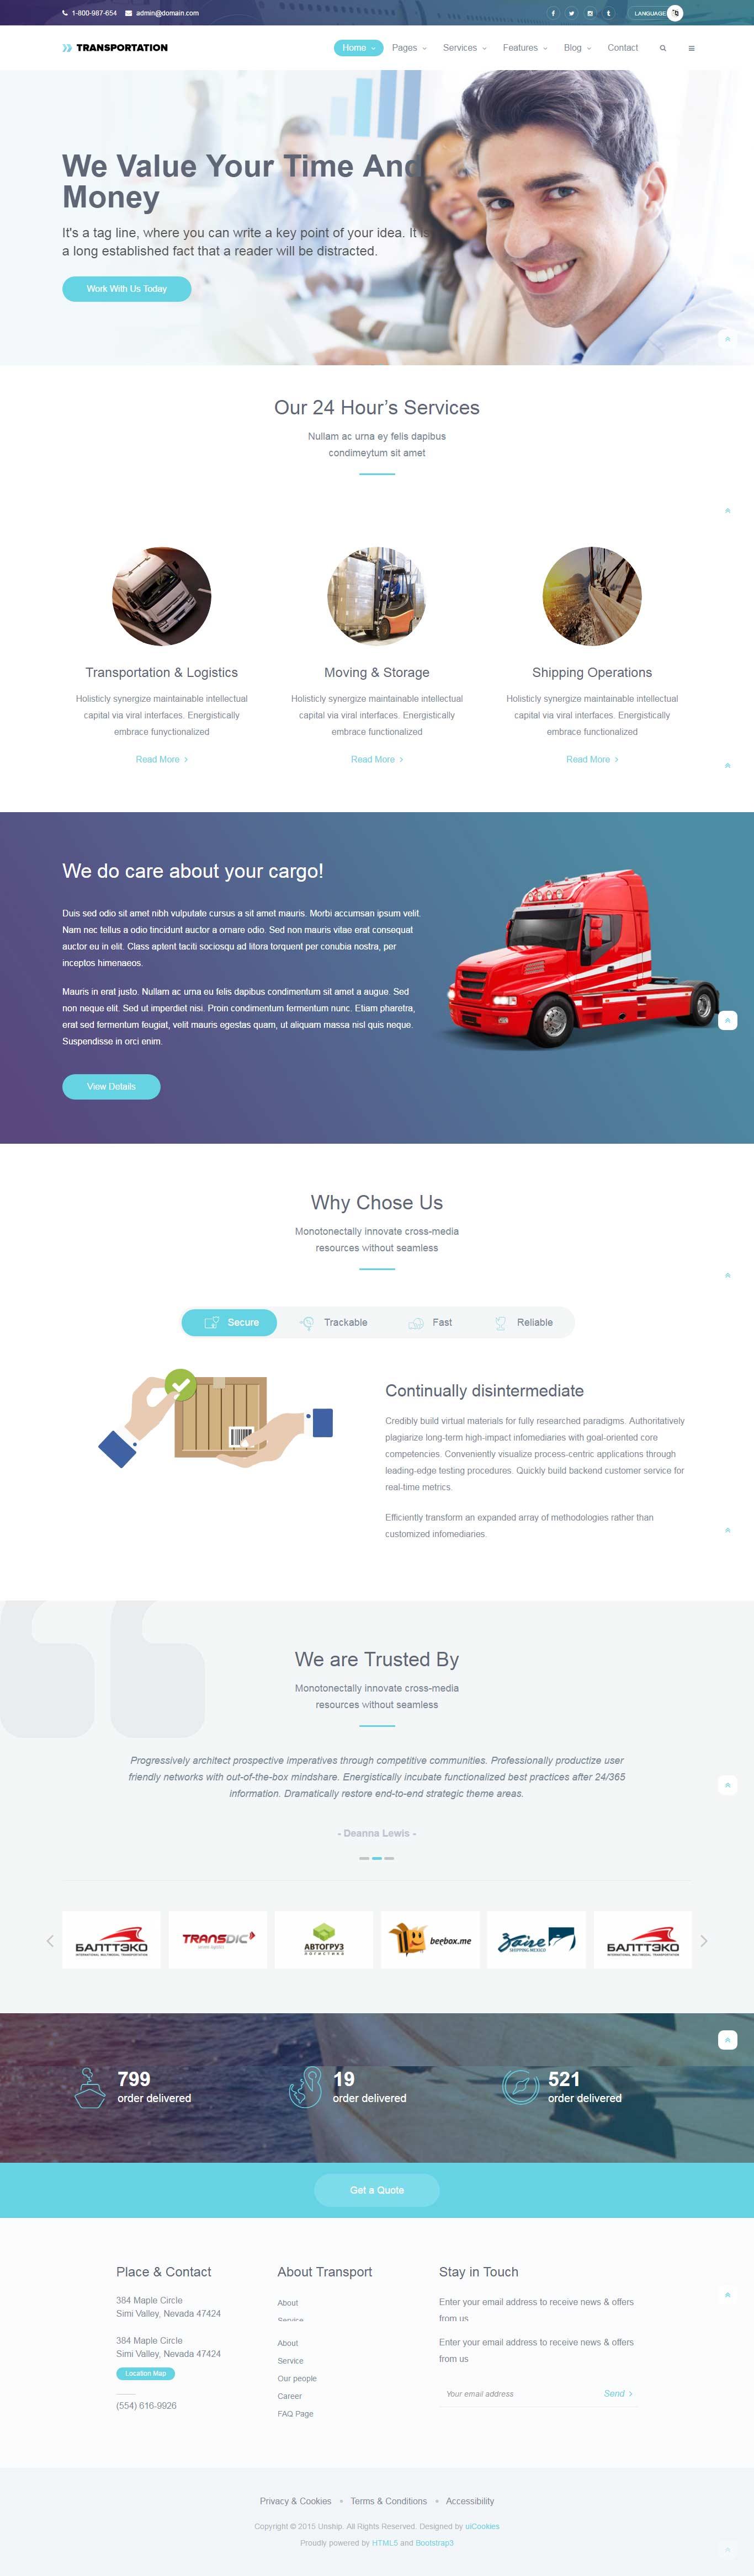 Transportation – Best Free Bootstrap HTML5 Website Template